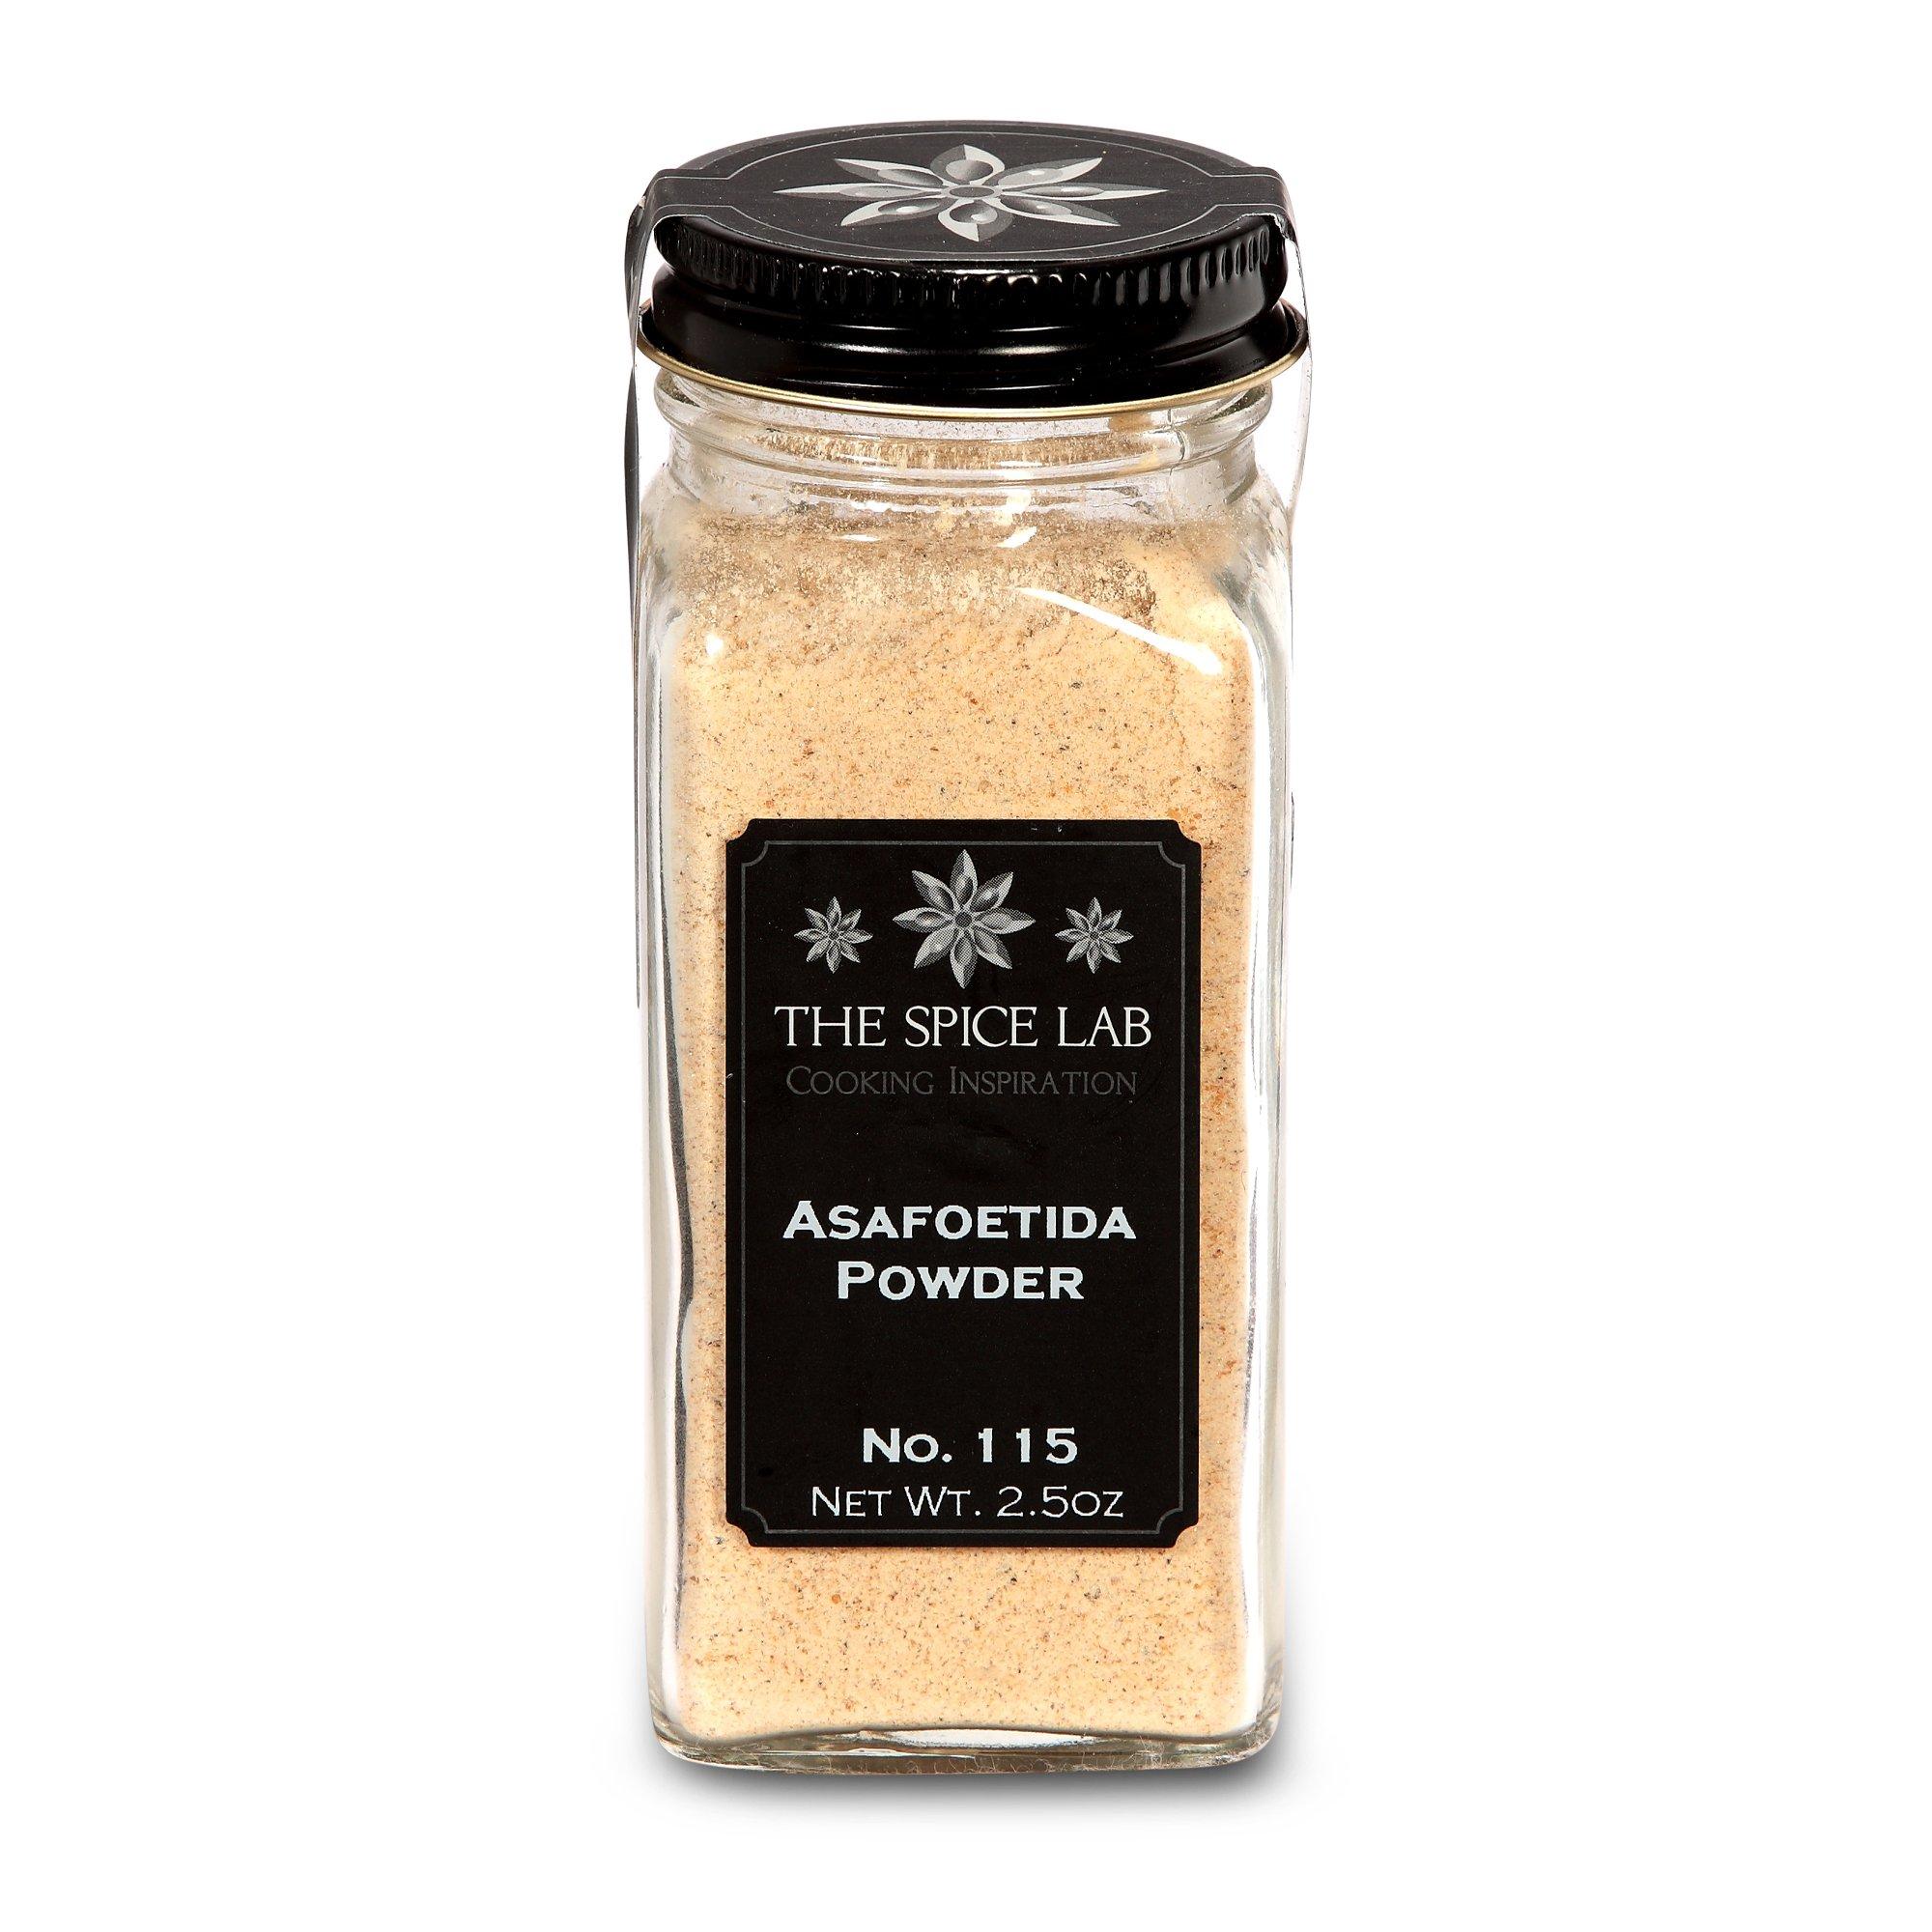 The Spice Lab No. 115 - Asafoetida Powder - Kosher Non-GMO All Natural Spice - French Jar